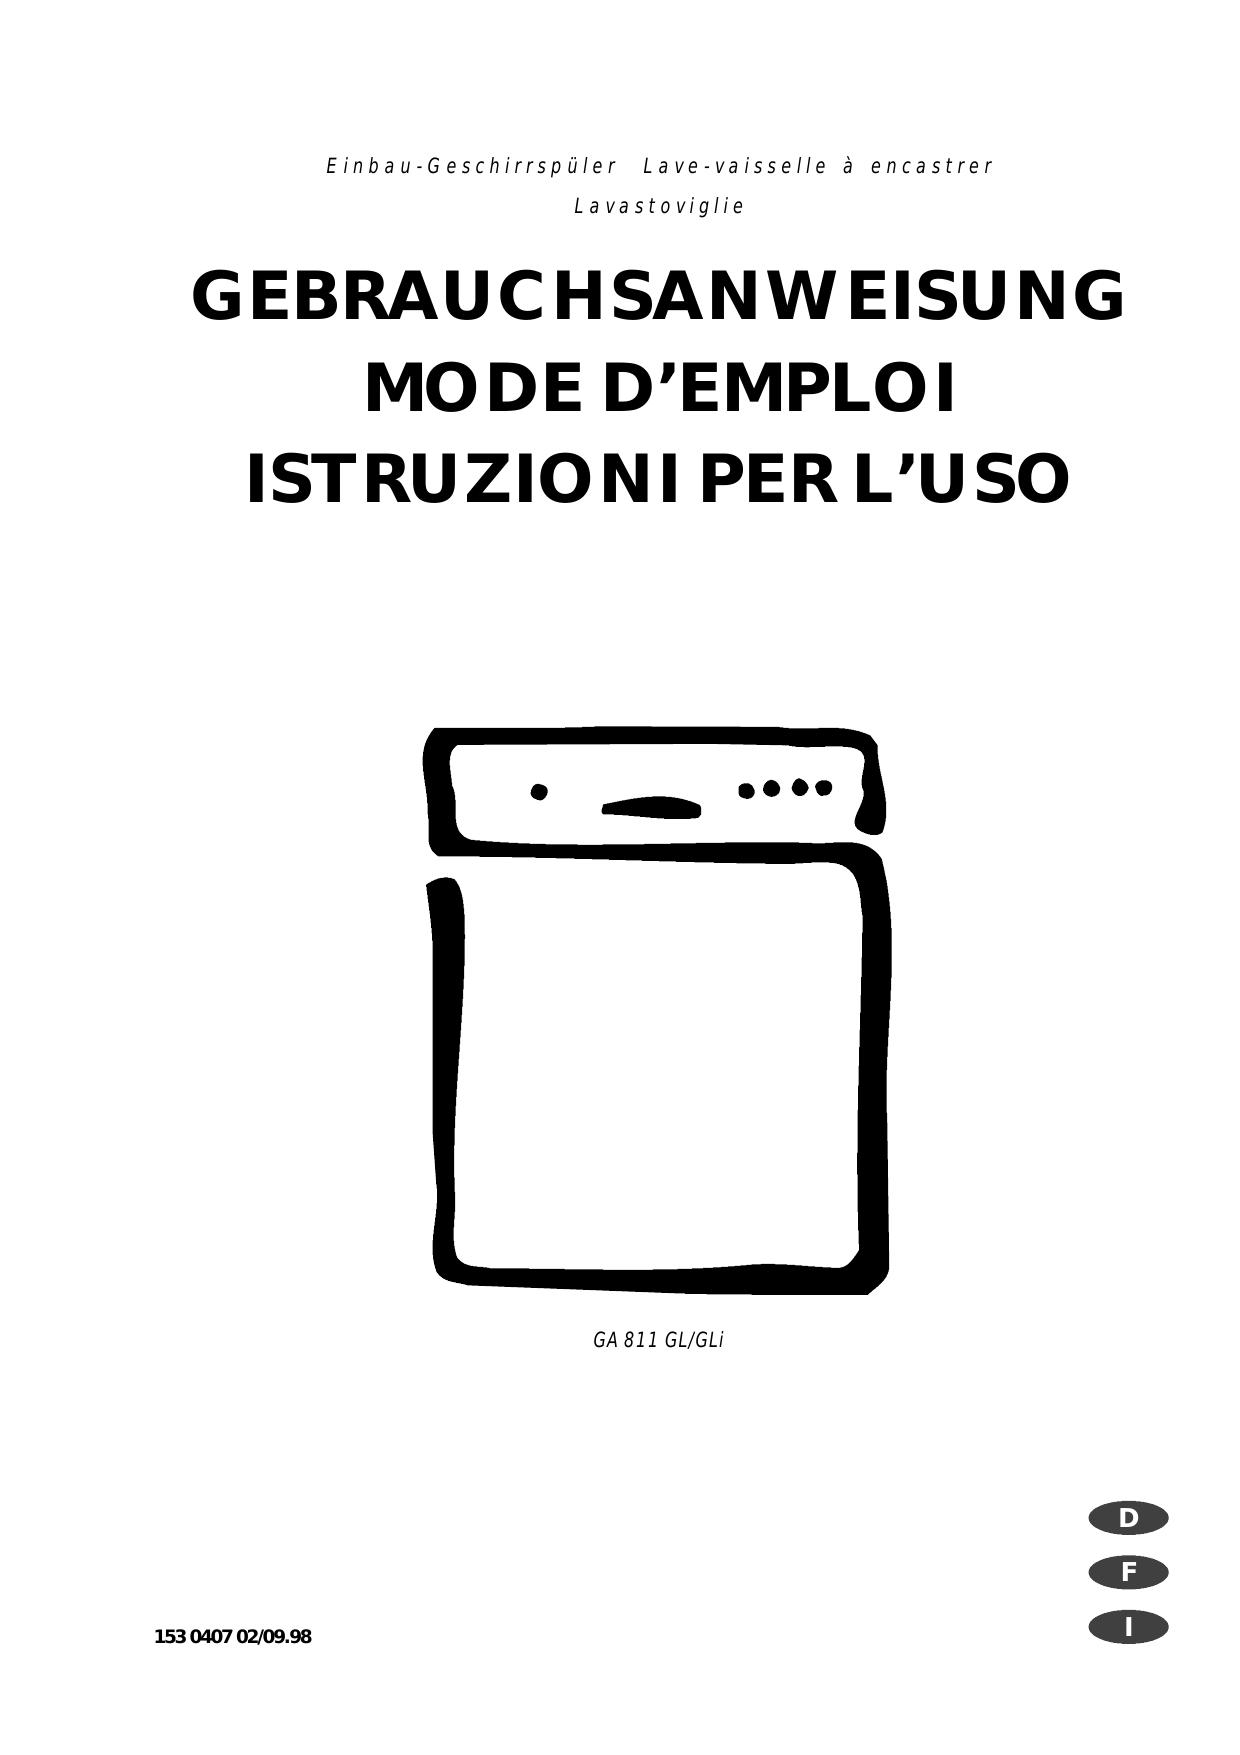 Electrolux Swissline L Geschirrspüler Reset